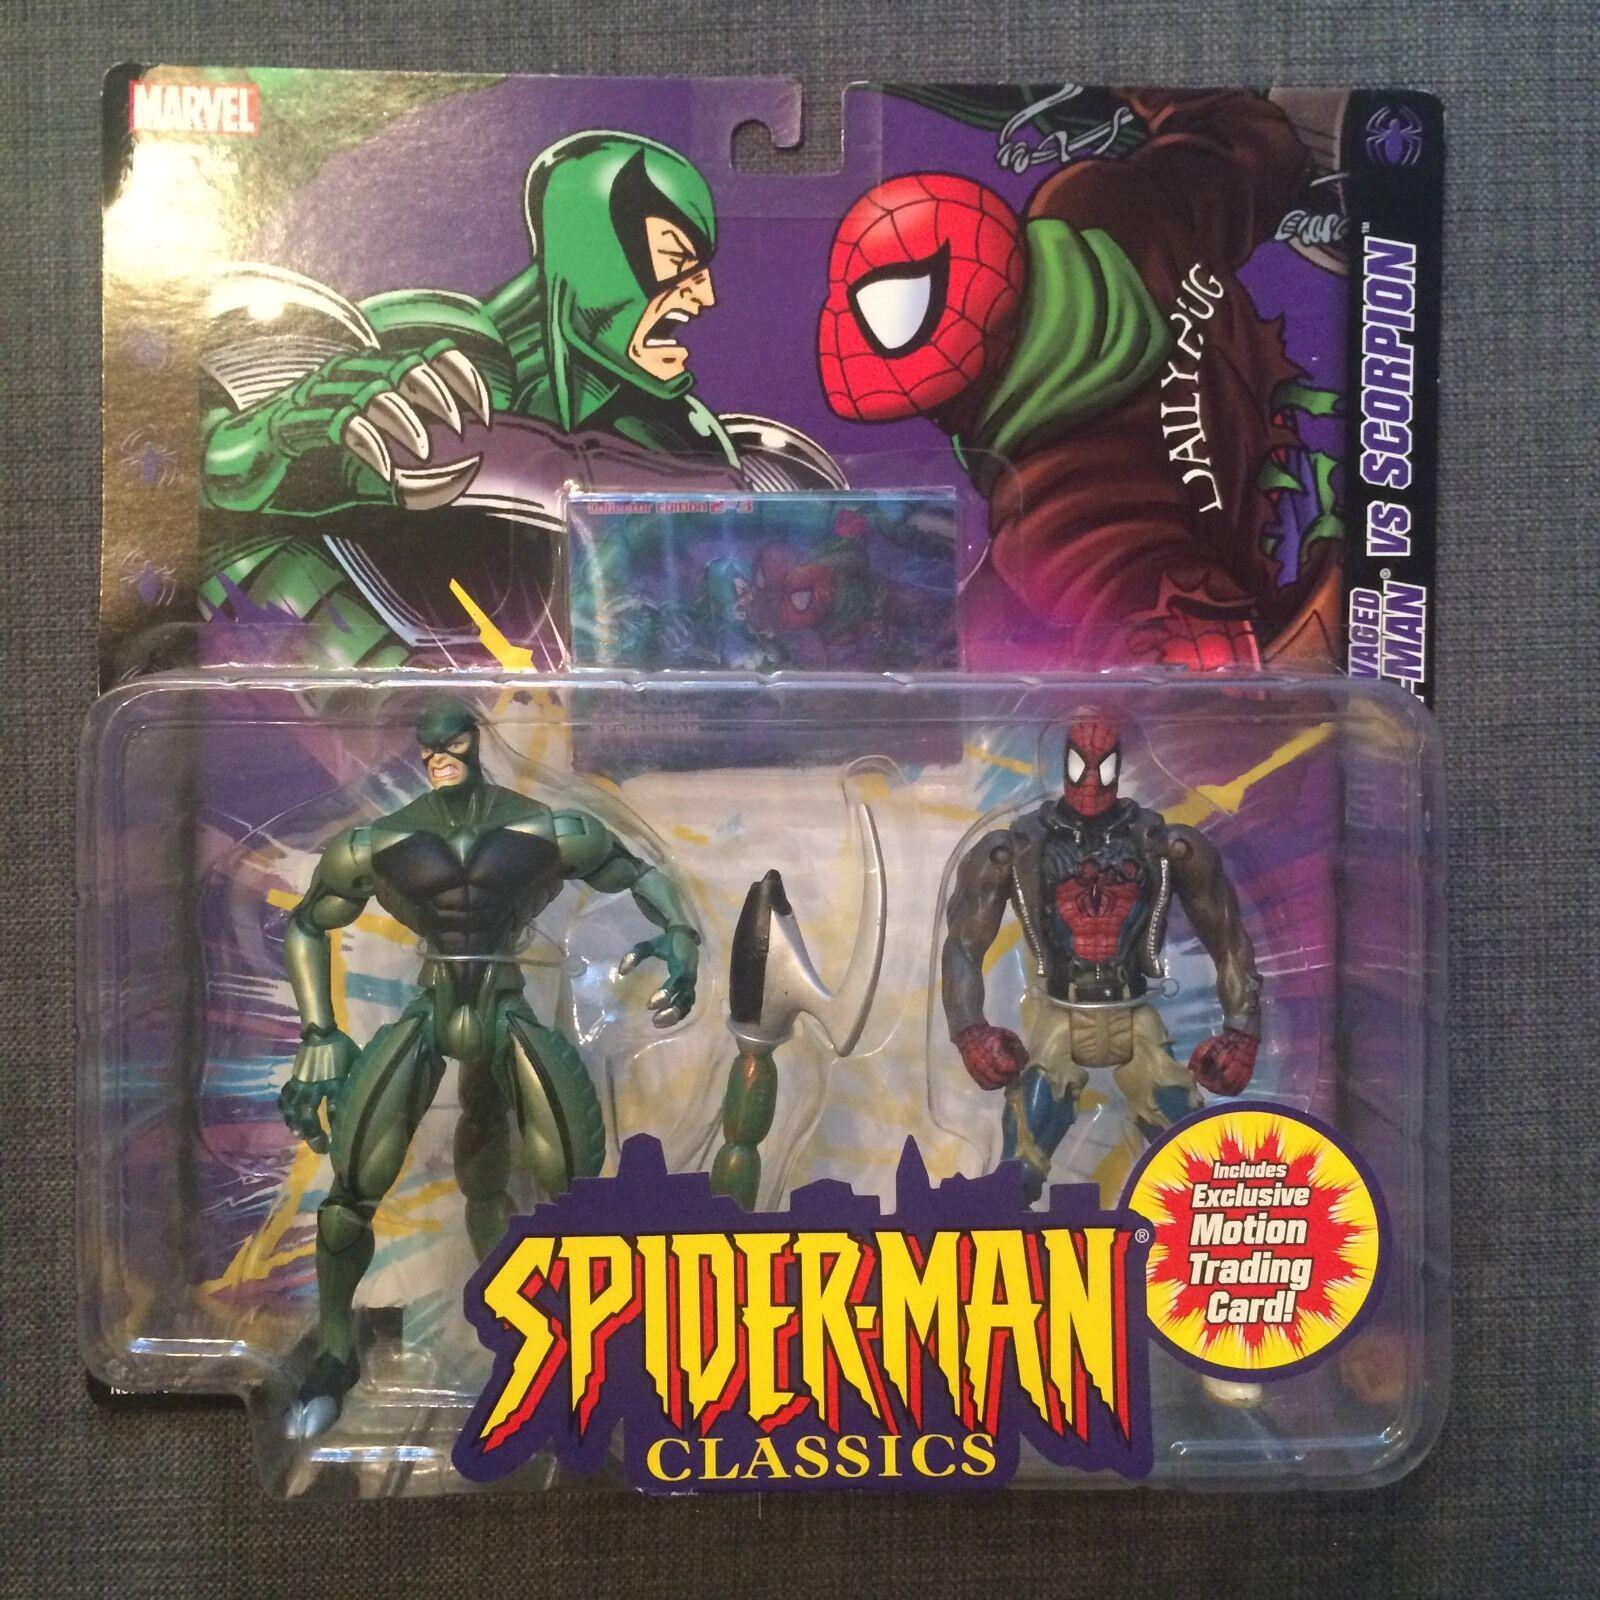 RARE BATTLE RAVAGED SPIDERMAN VS SCORPION Marvel Classics Exclusive Trading Card